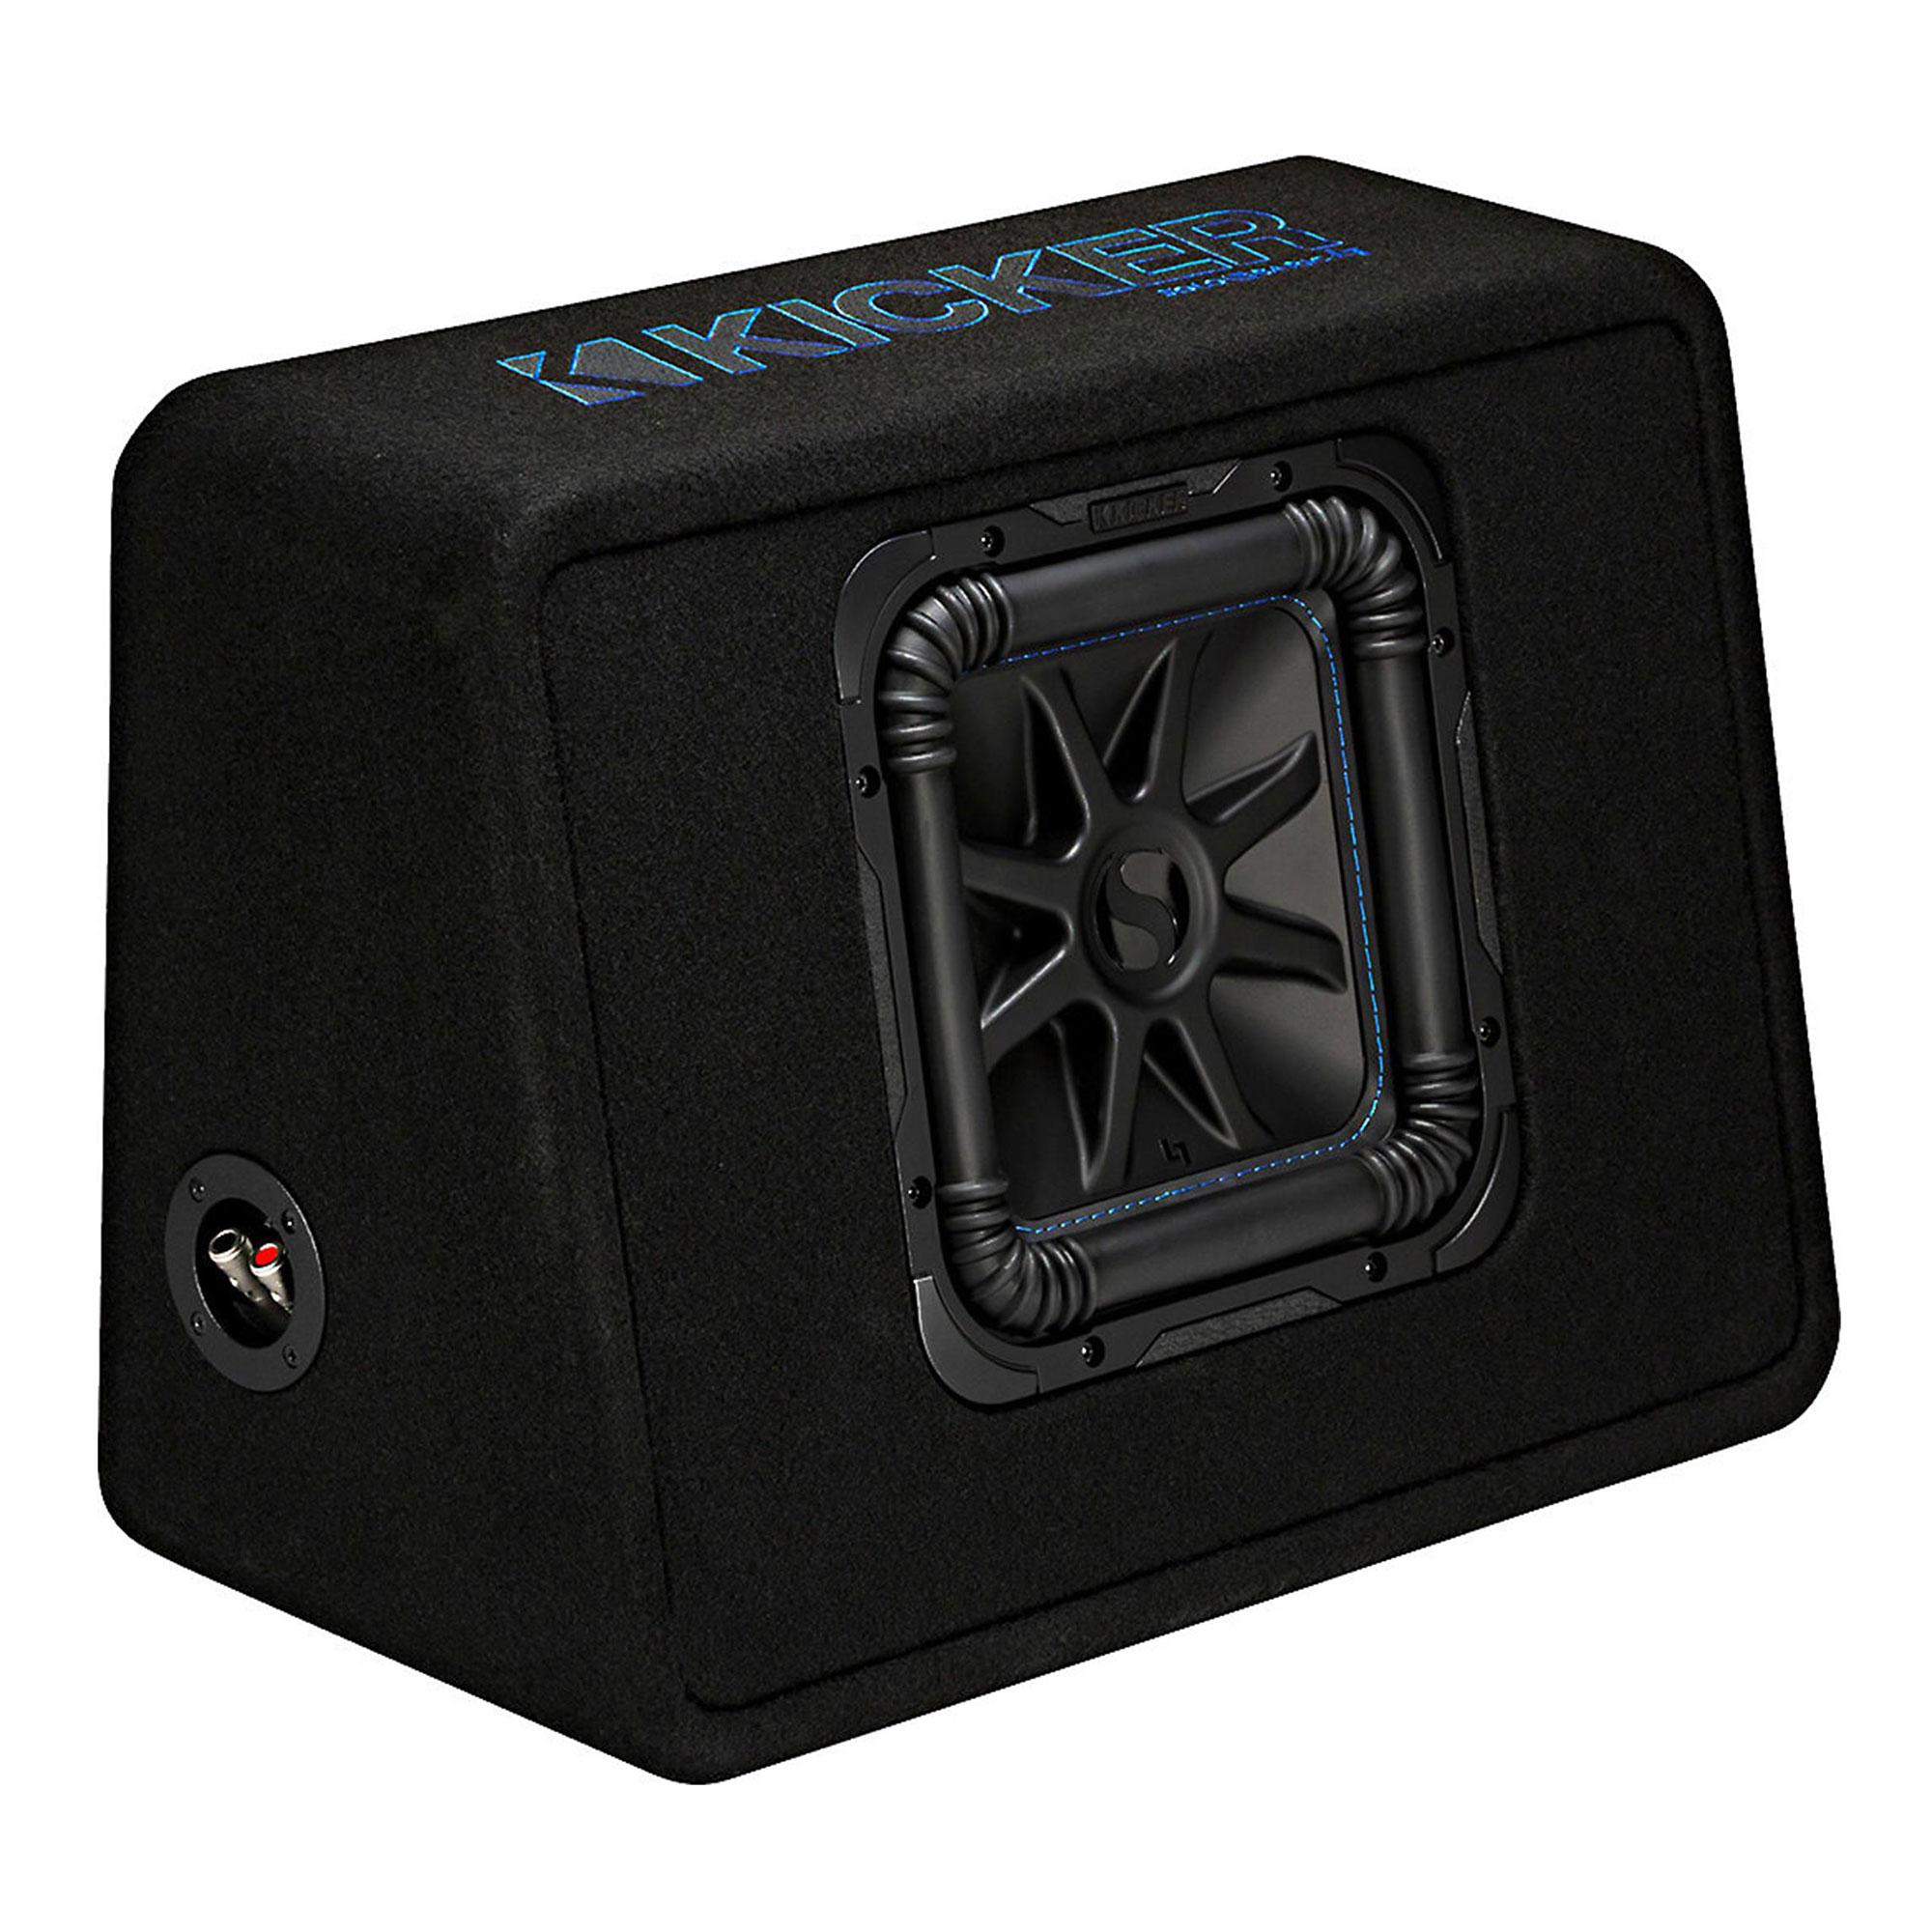 Kicker 10 1200w Single Loaded Solo Baric L7s Subwoofer Enclosure Jl Audio Xd Acs60 6 Gauge Amplifier Amp Wire Installation Kit Speaker 44tl7s102